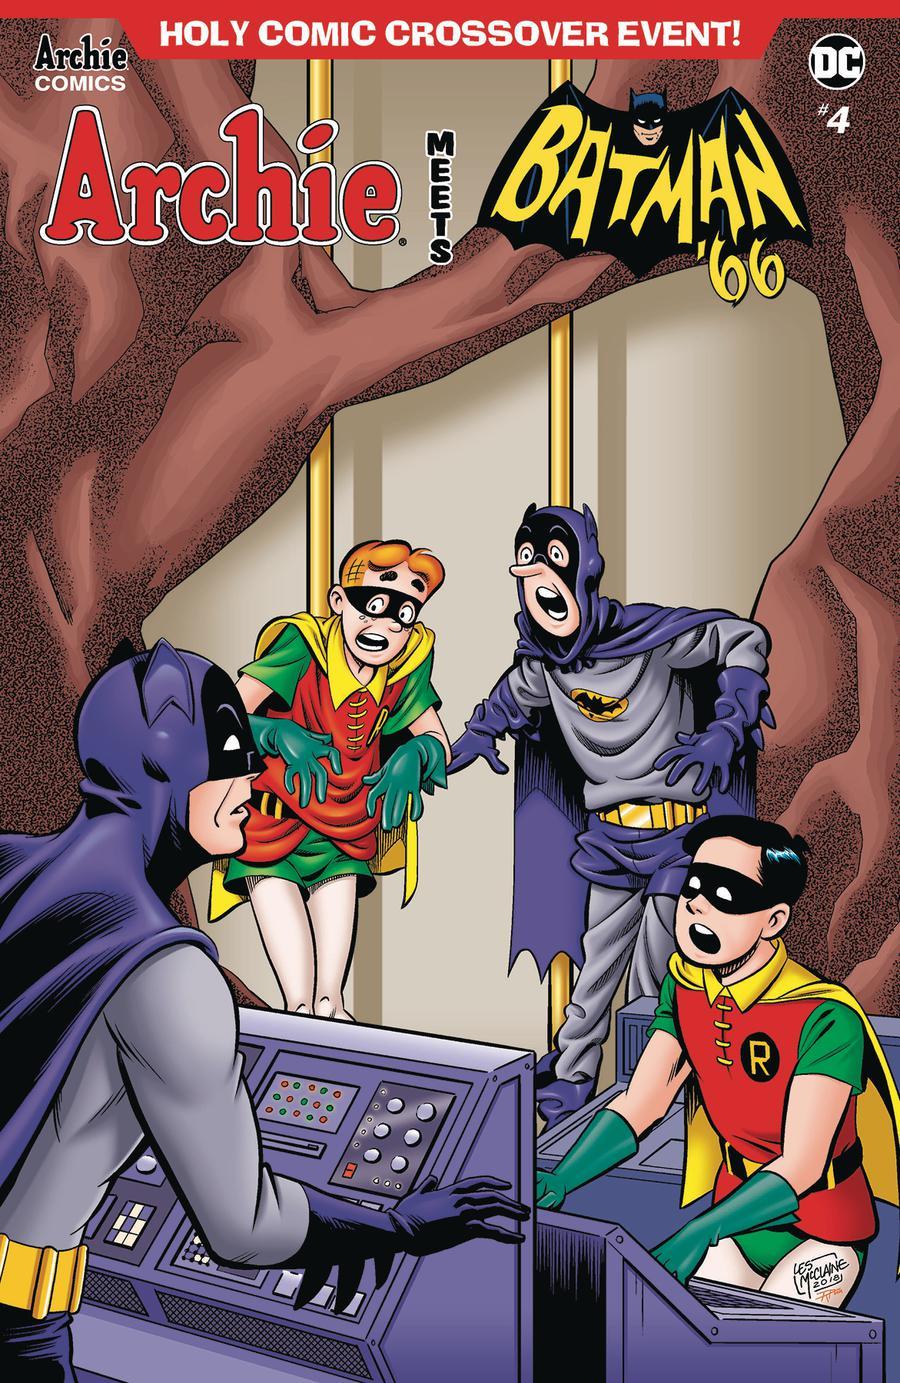 Archie Meets Batman 66 #4 Cover C Variant Les McClaine & Rosario Tito Pena Cover